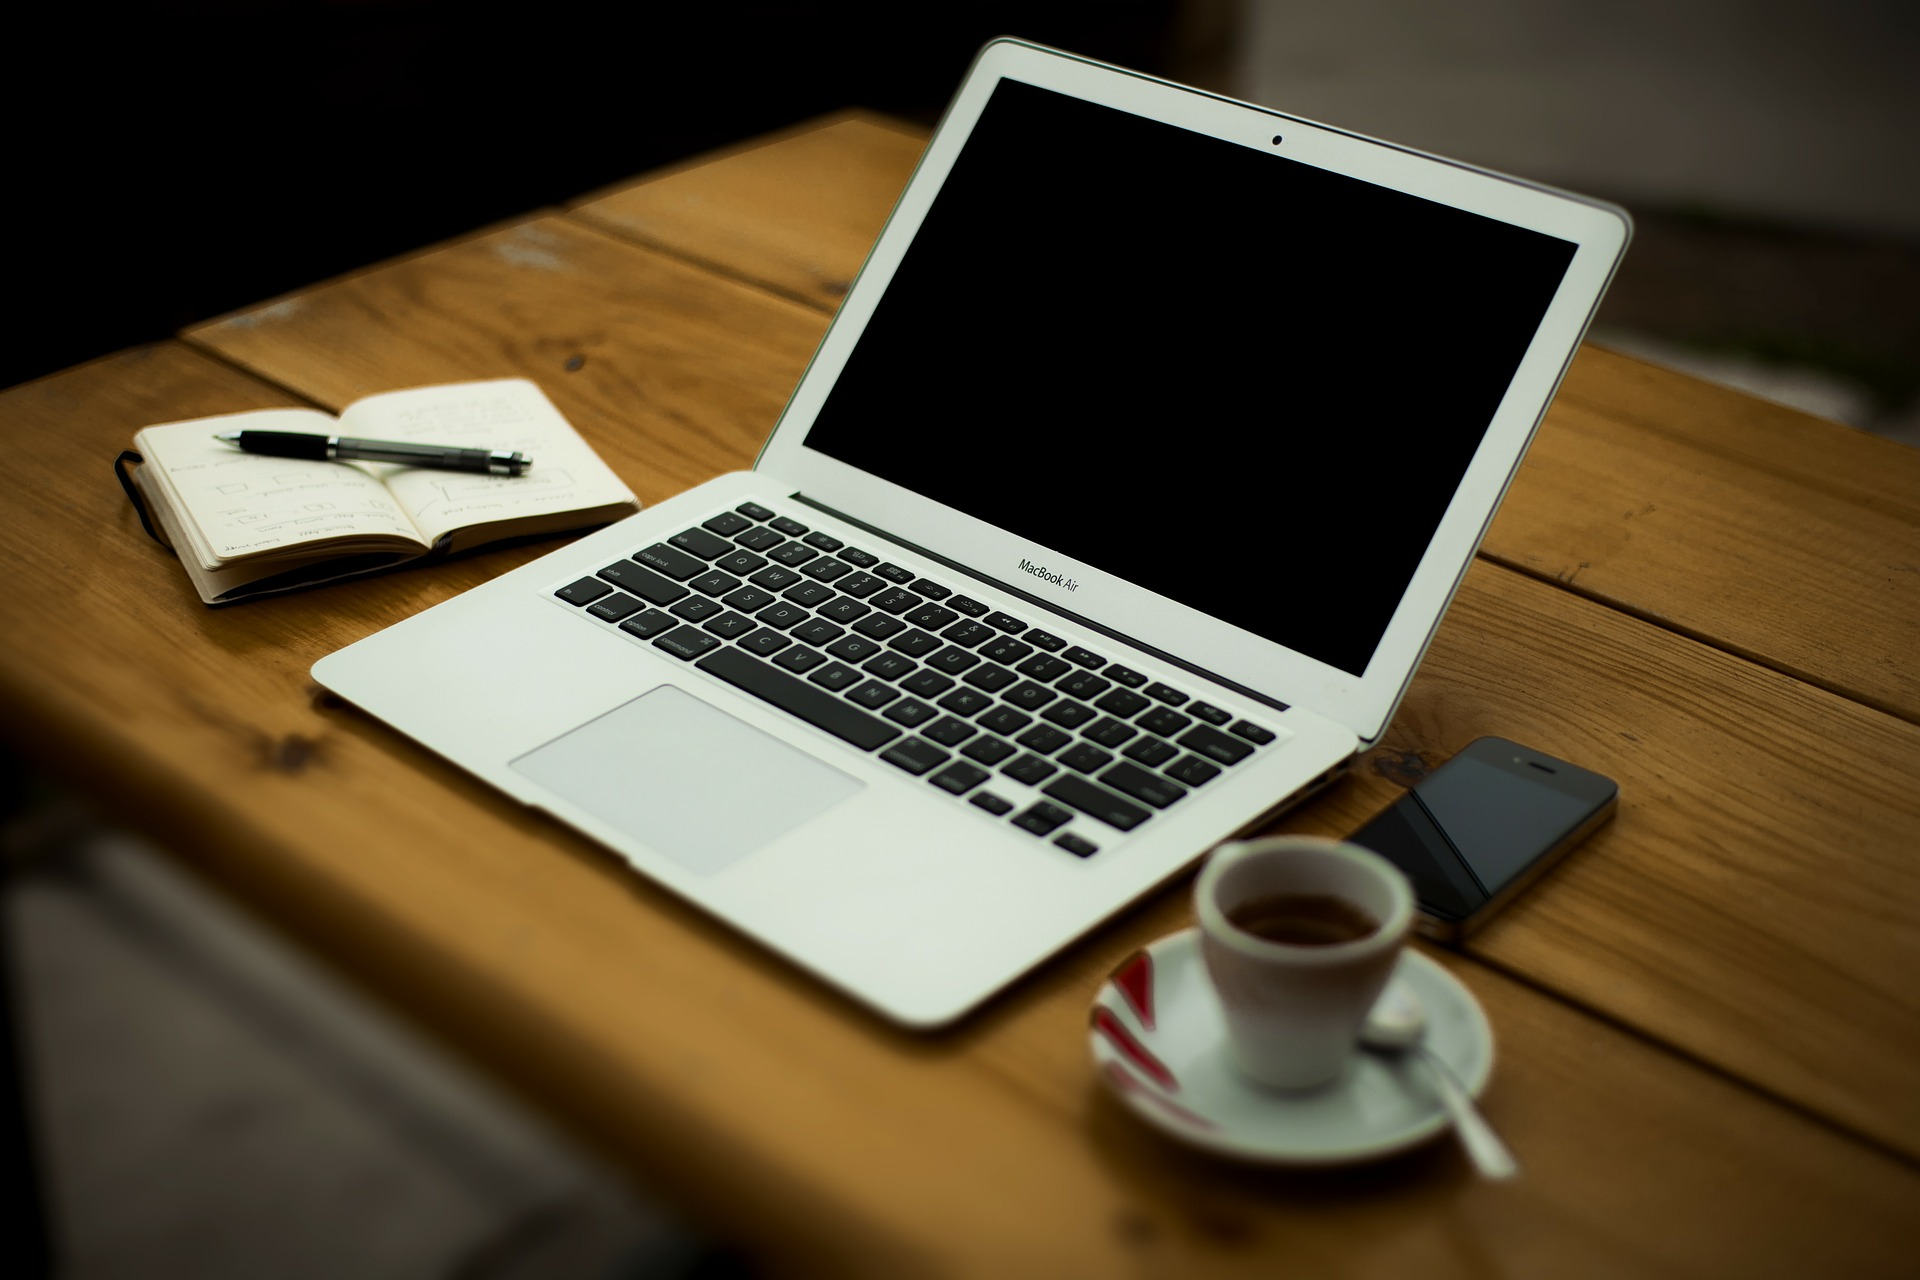 article image - uploaded by lookatdesktop